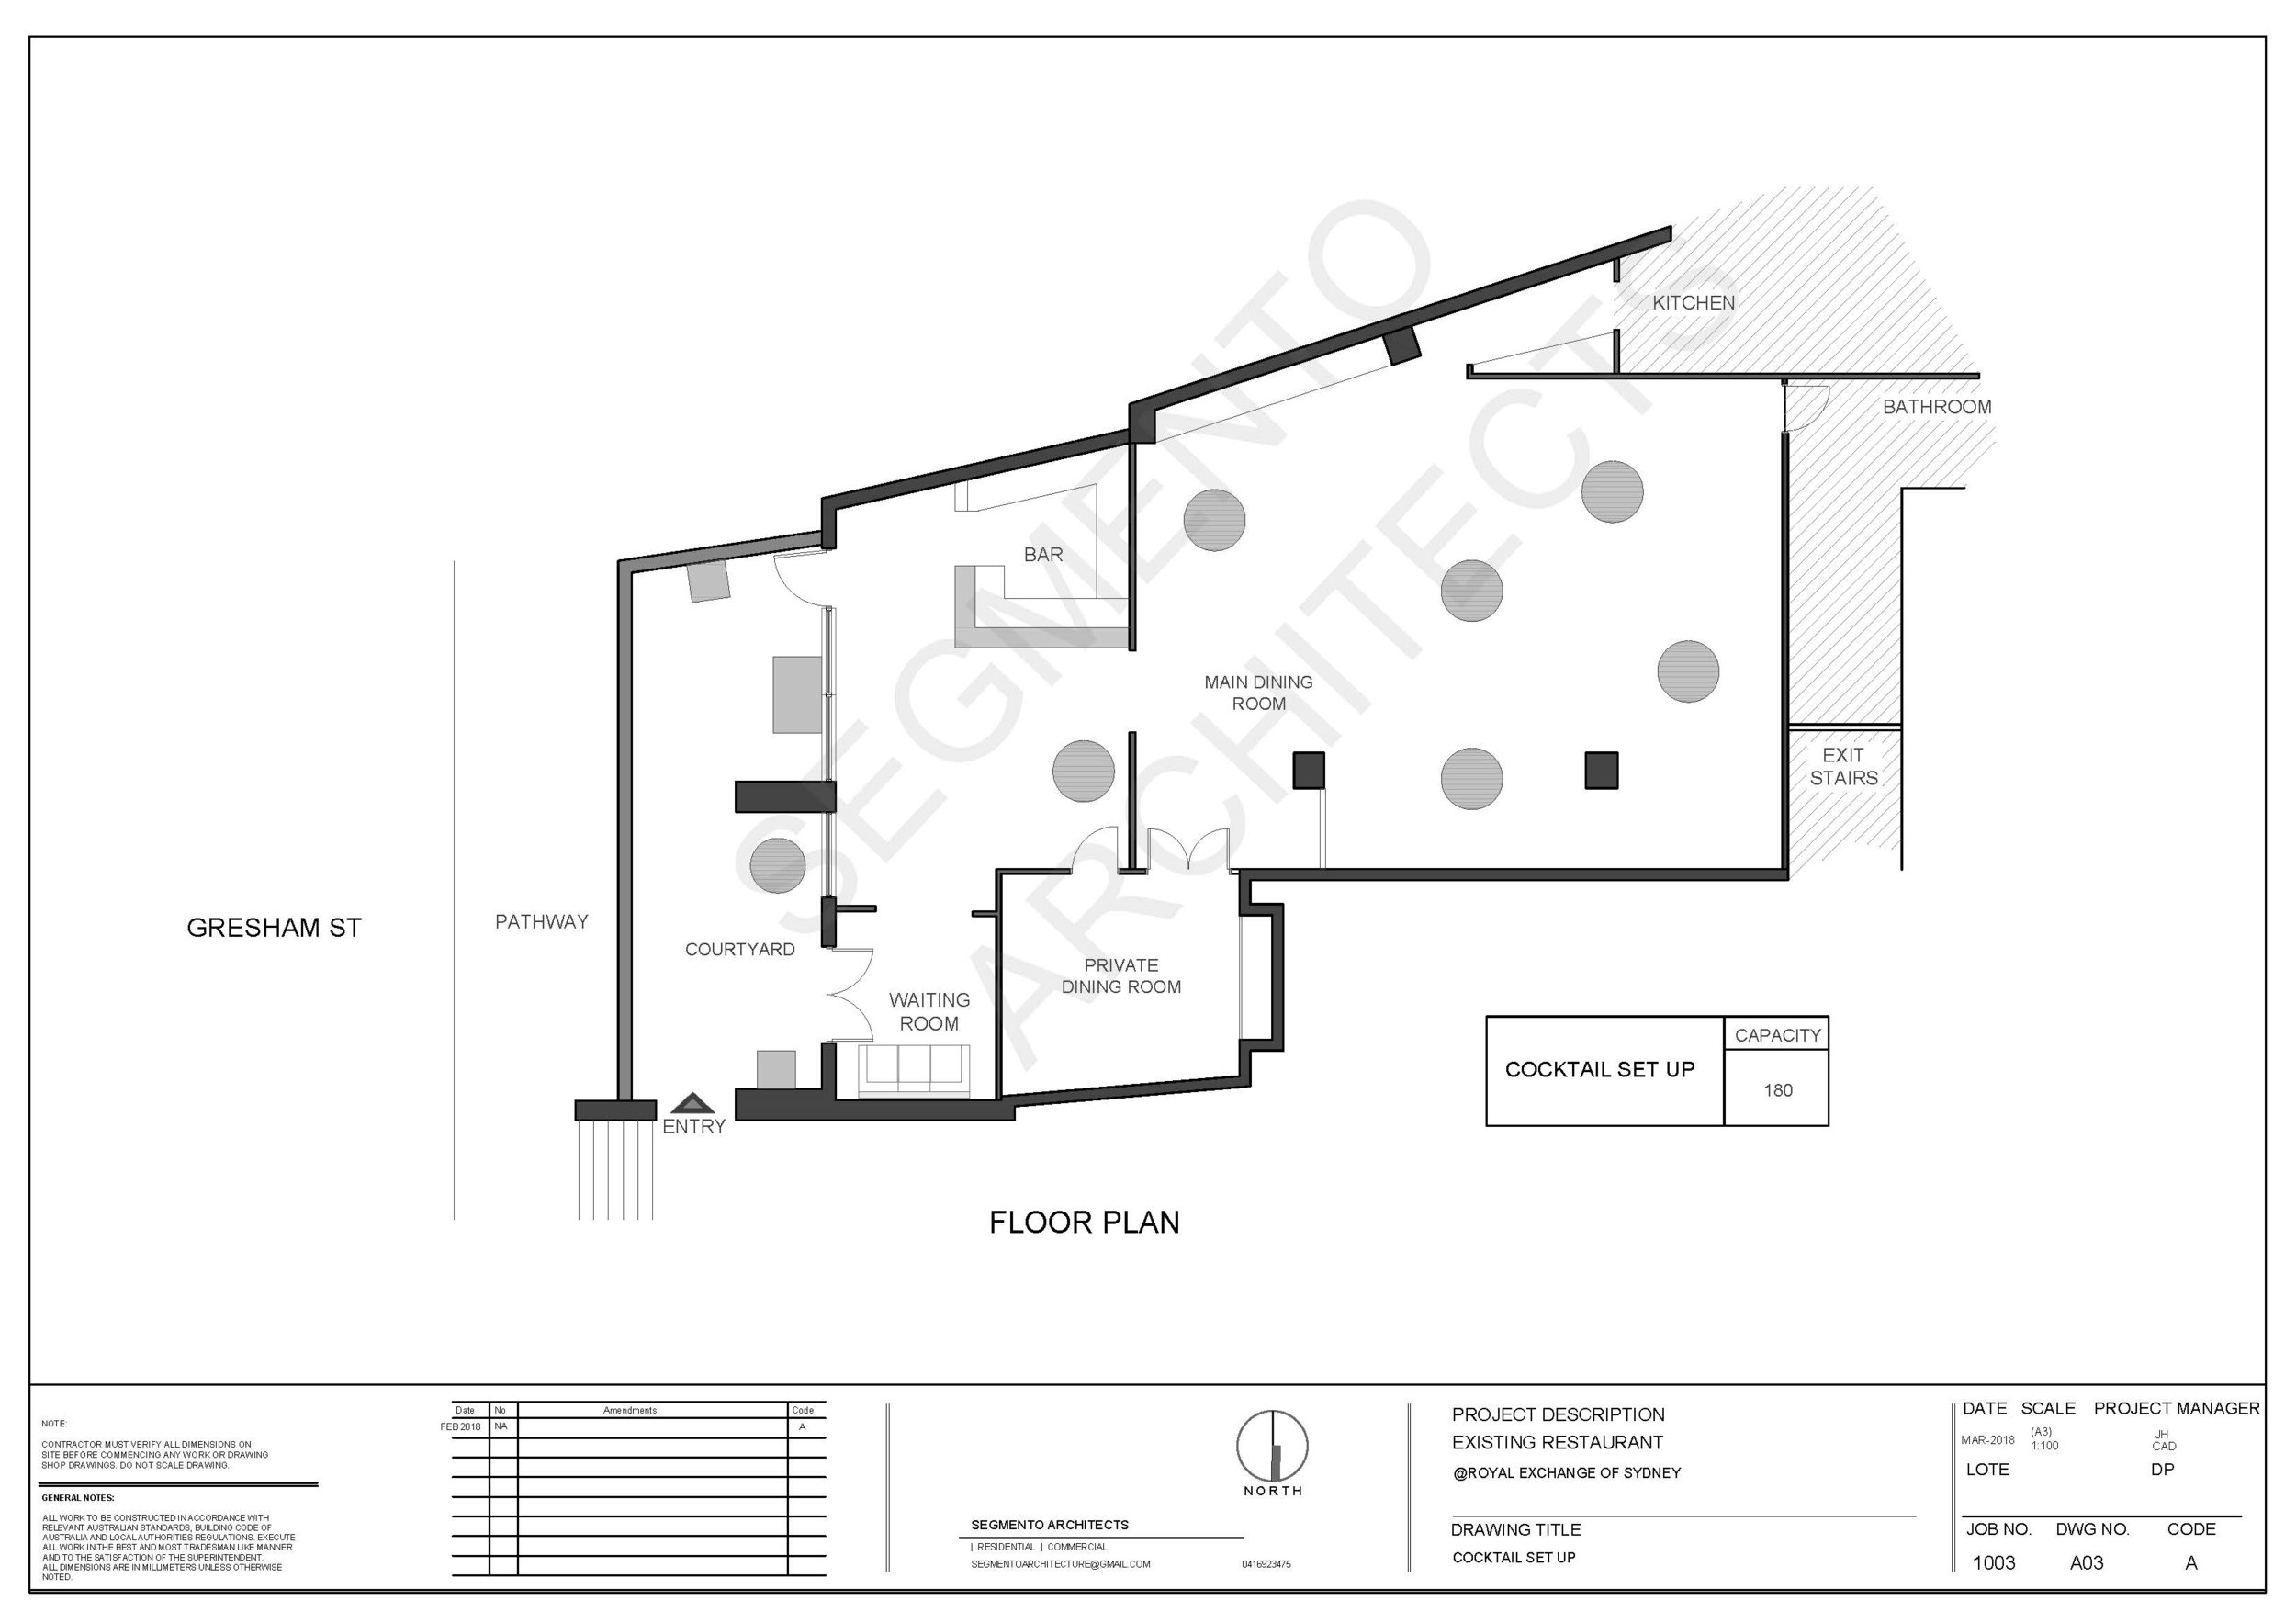 ROYAL EXCHANGE_Floorplans Combined_Page_4.jpg